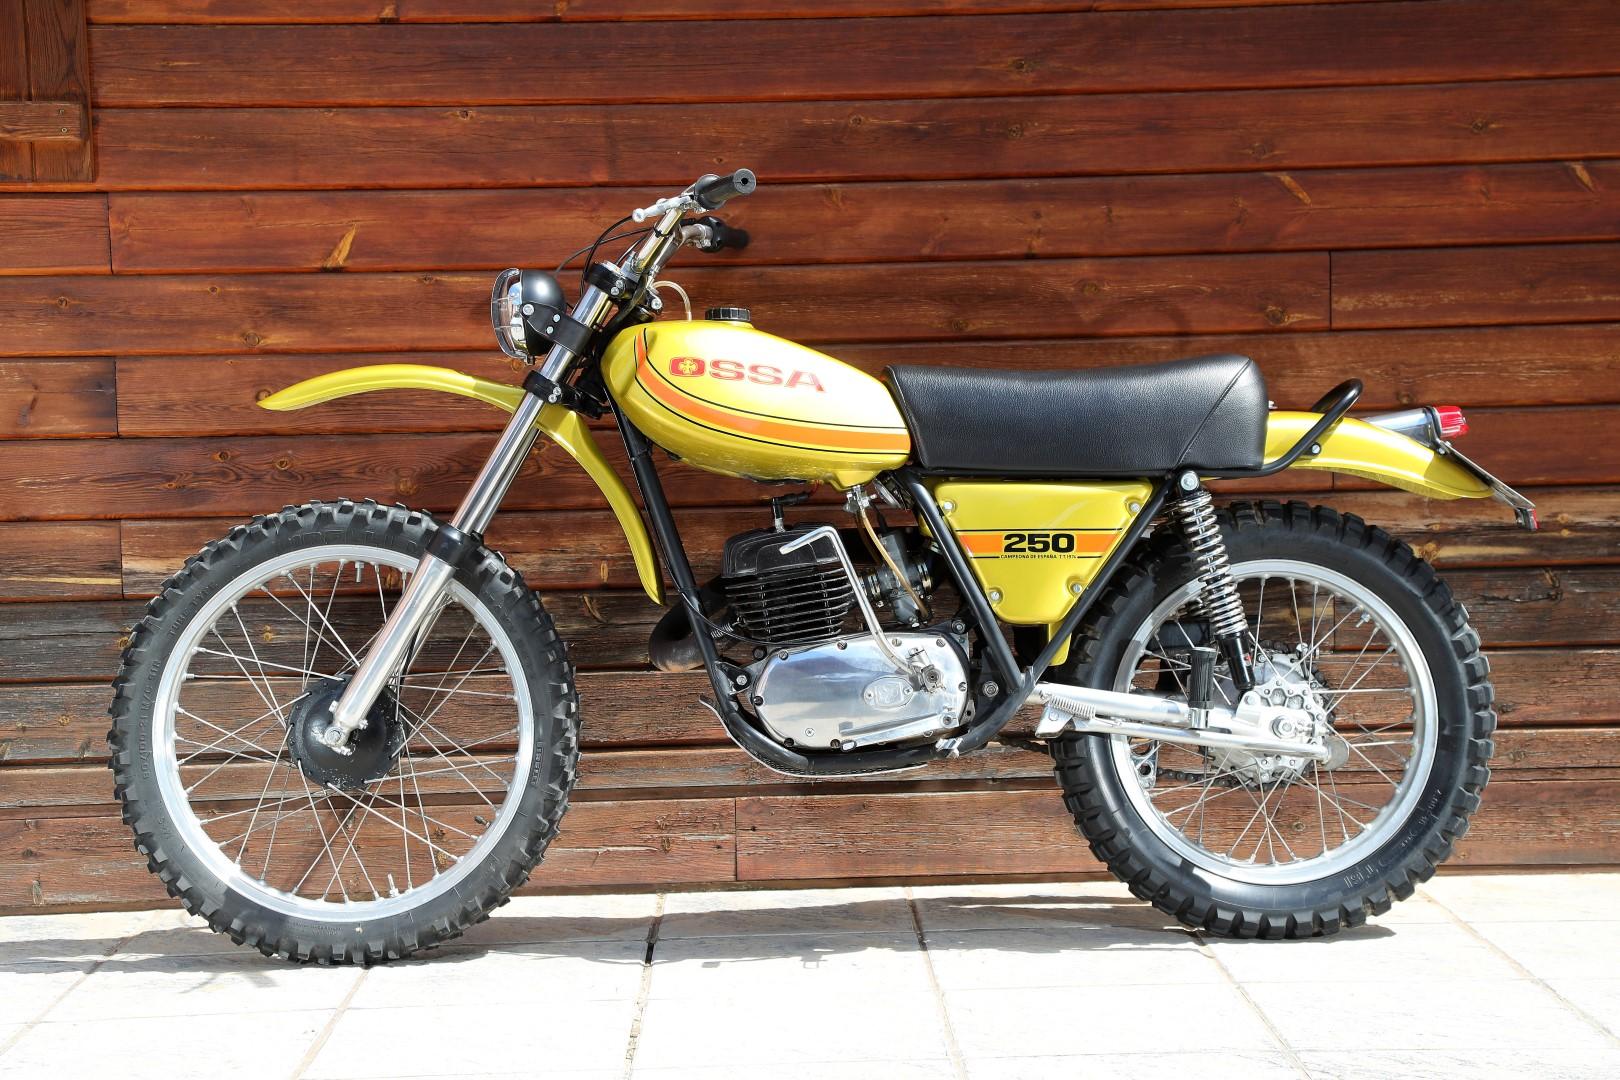 OSSA Super Pioneer 250 1975